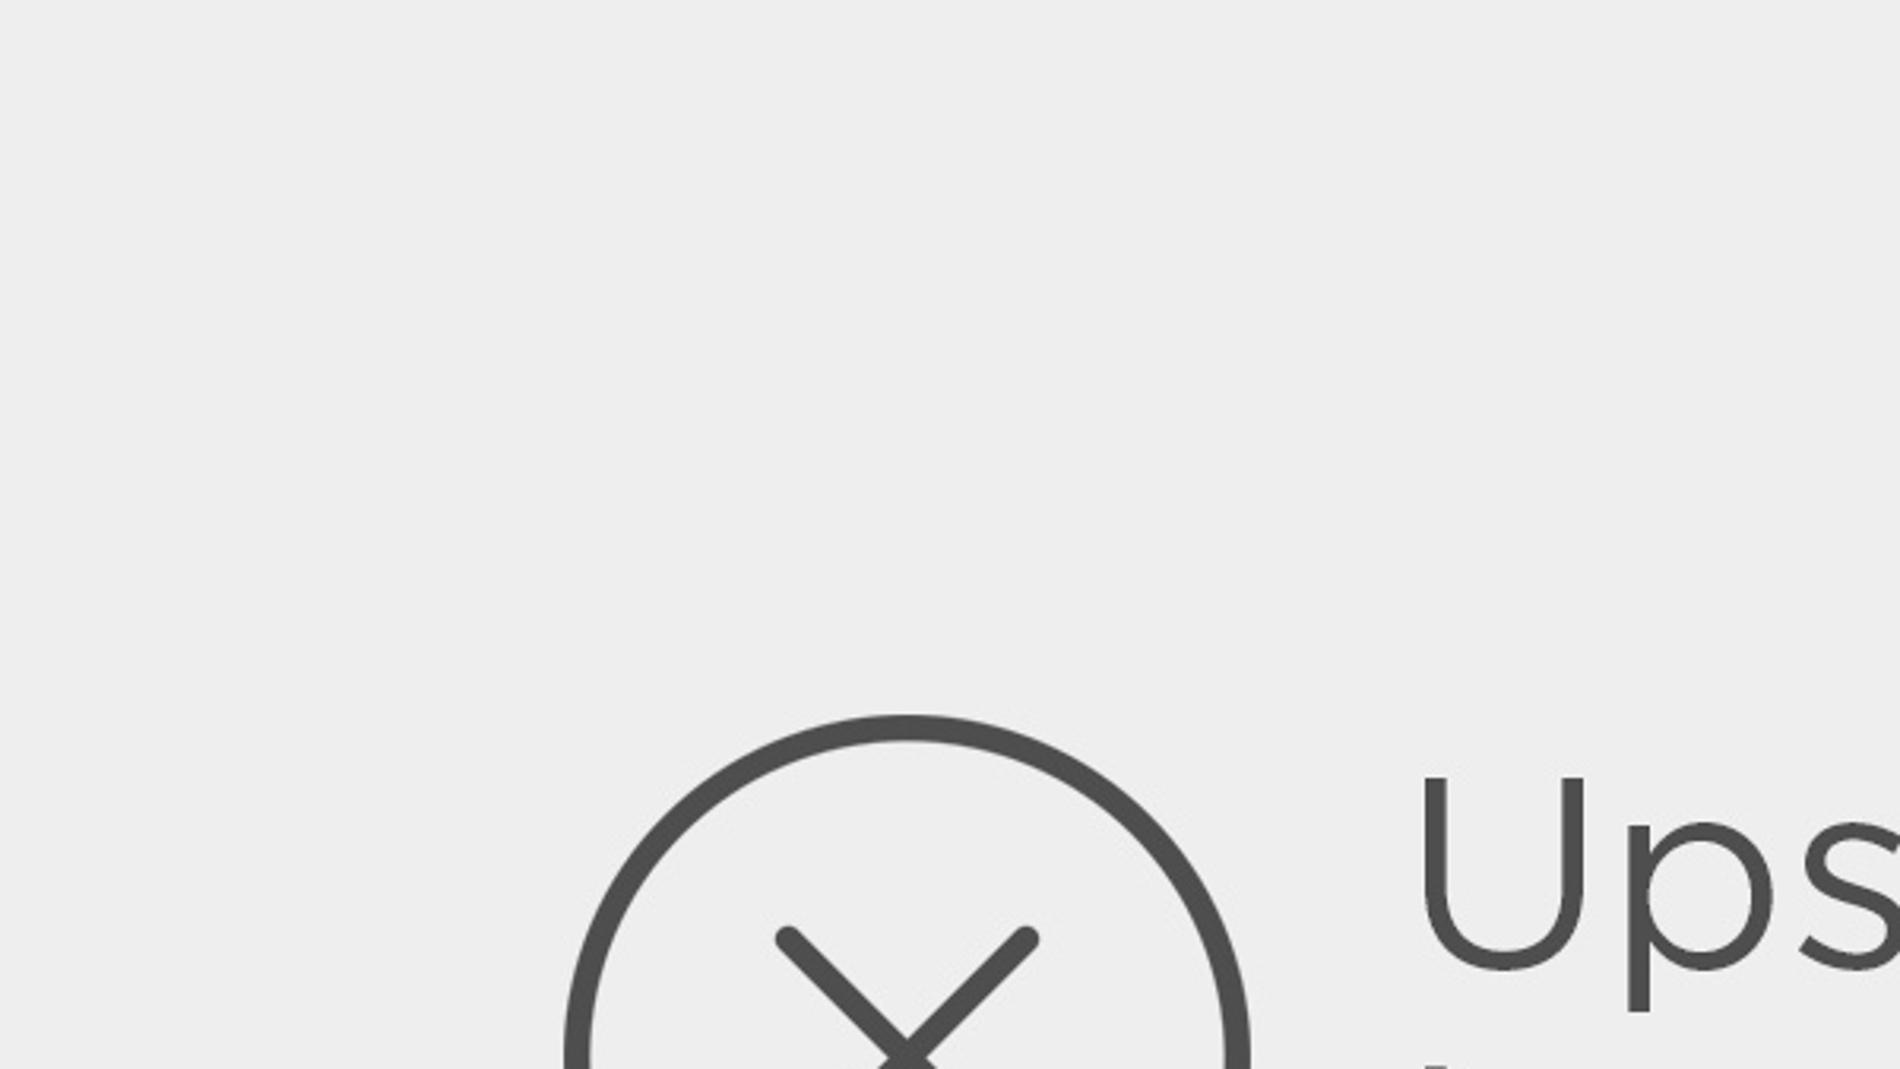 Sylvester Stallone se hace un selfie a lo 'Rocky' con un grupo de fans